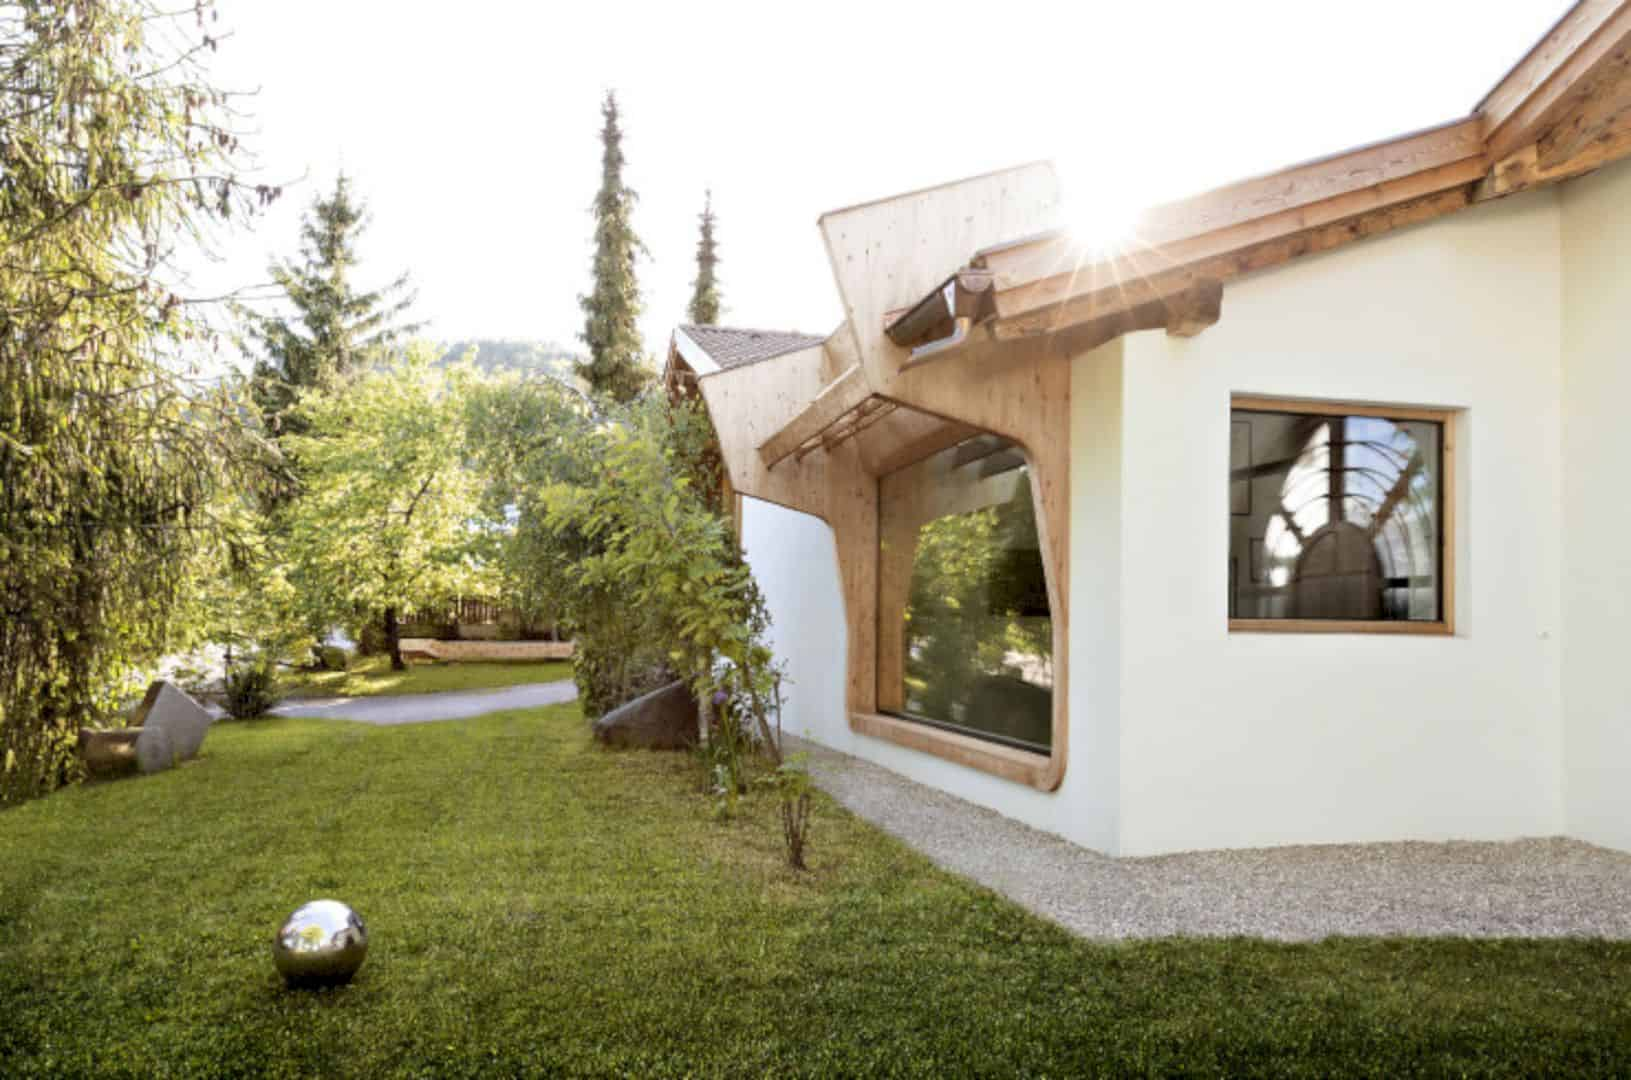 Studio Franz Messner Renovation 8